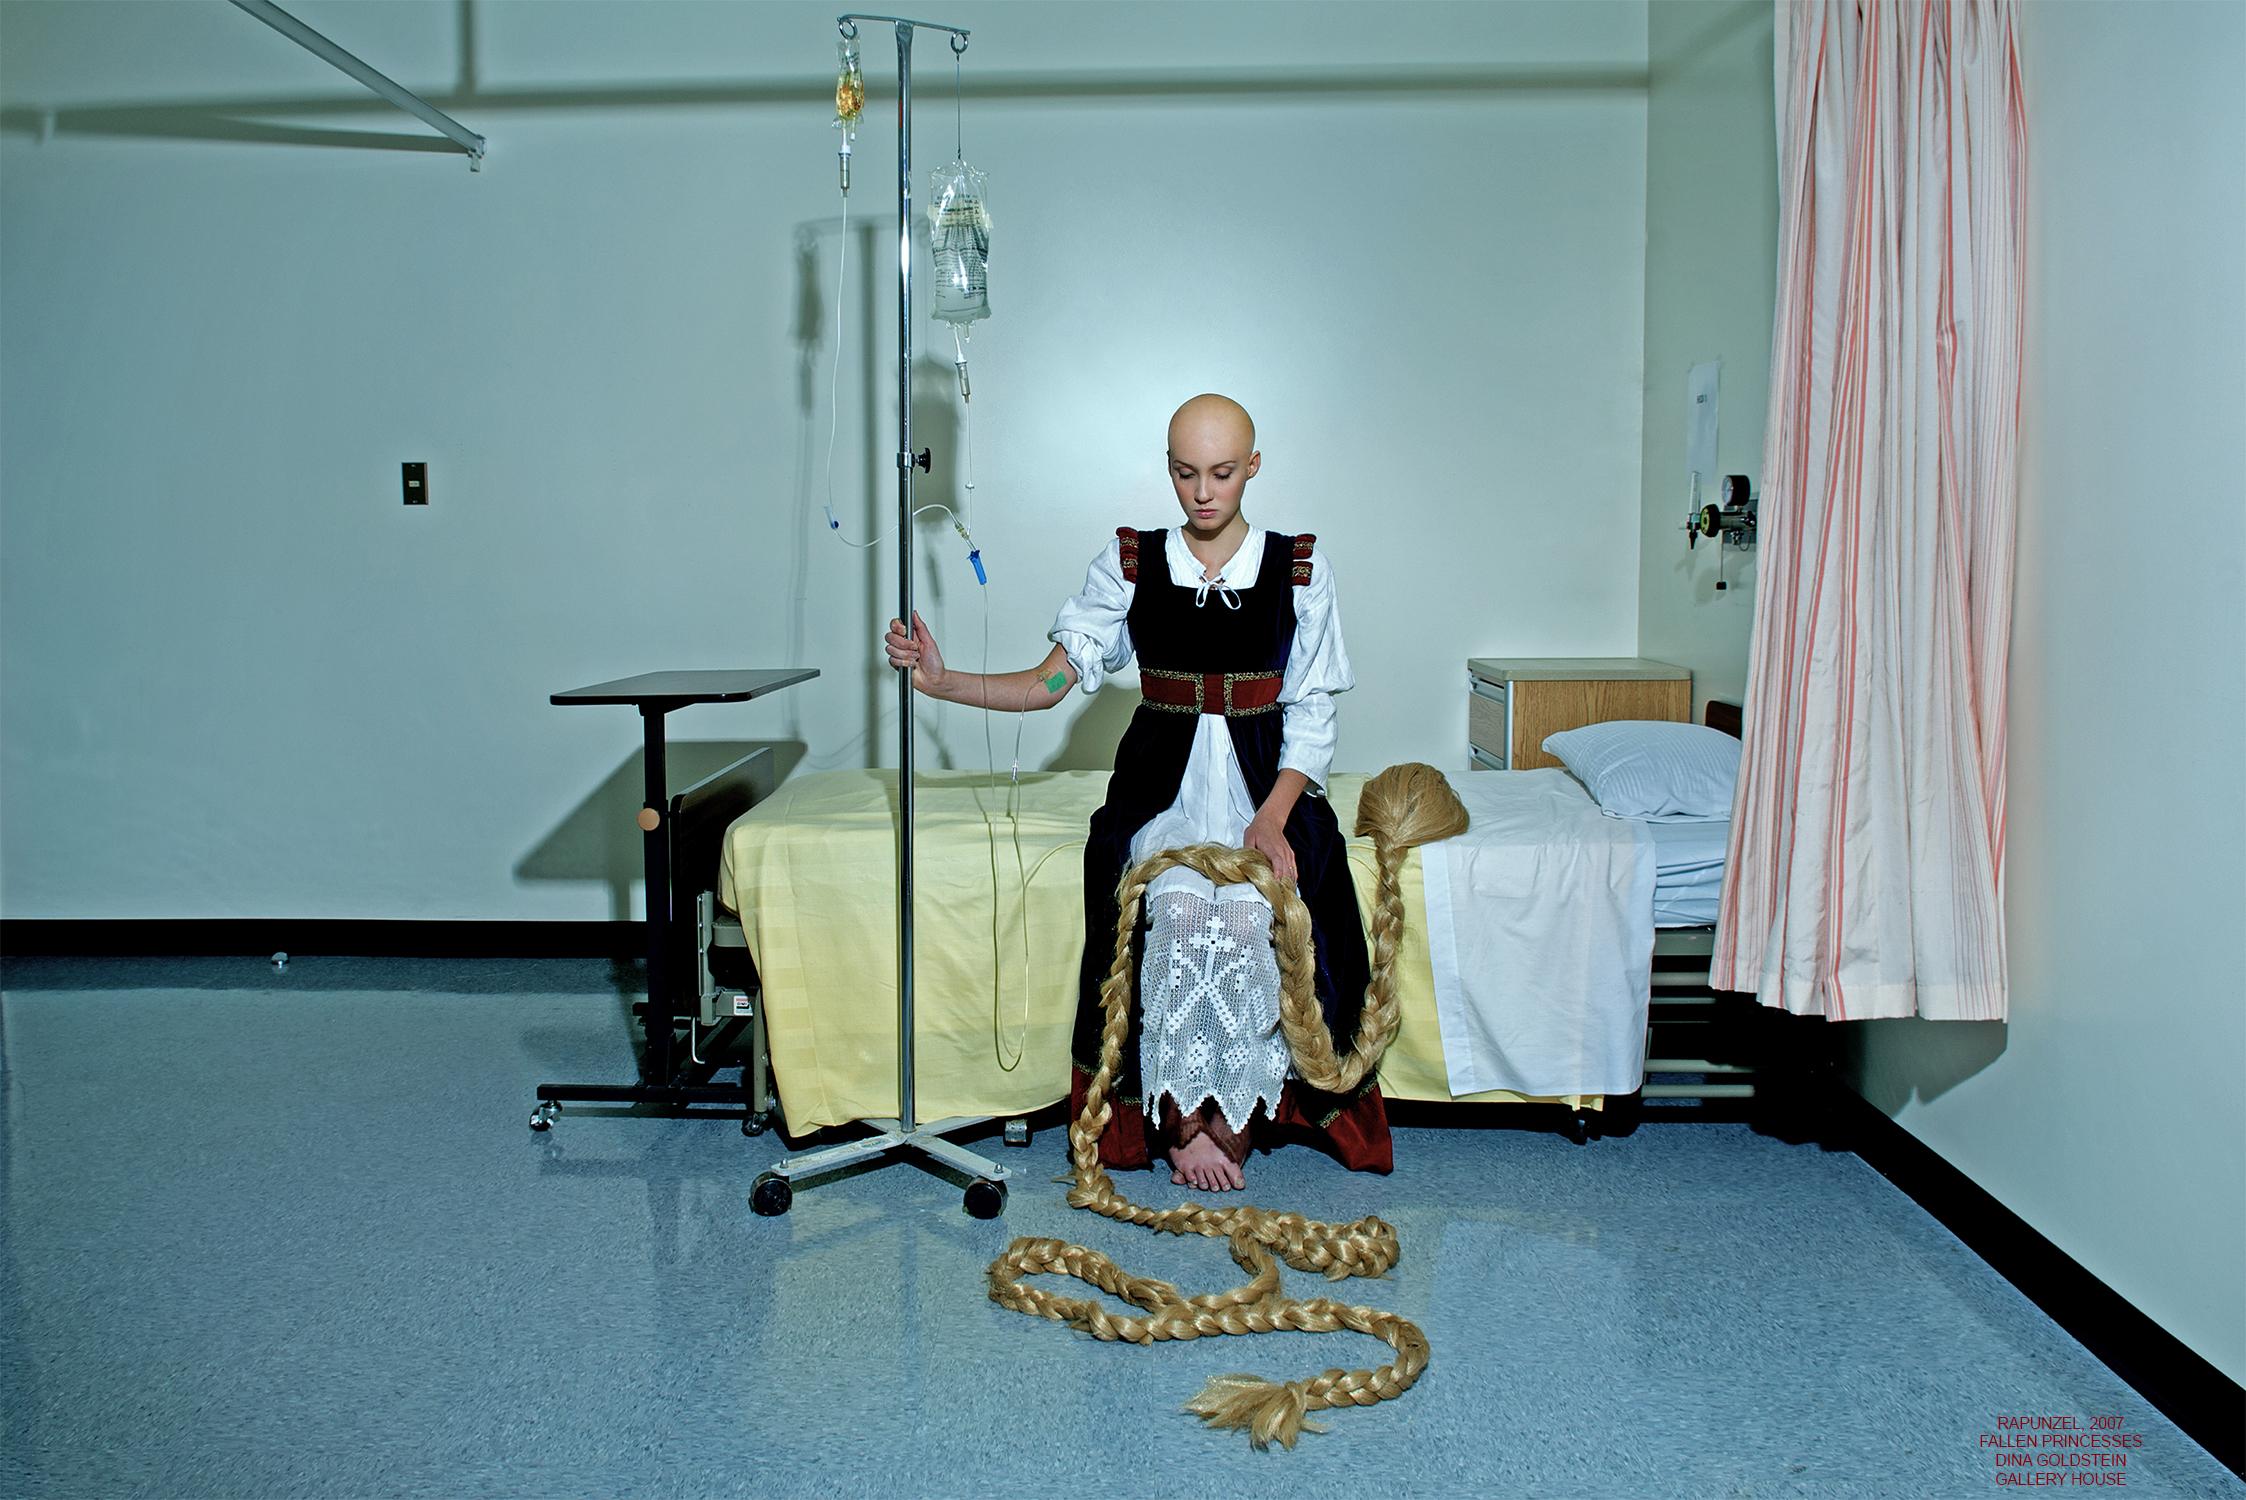 Dina Goldstein, Rapunzel, 2007